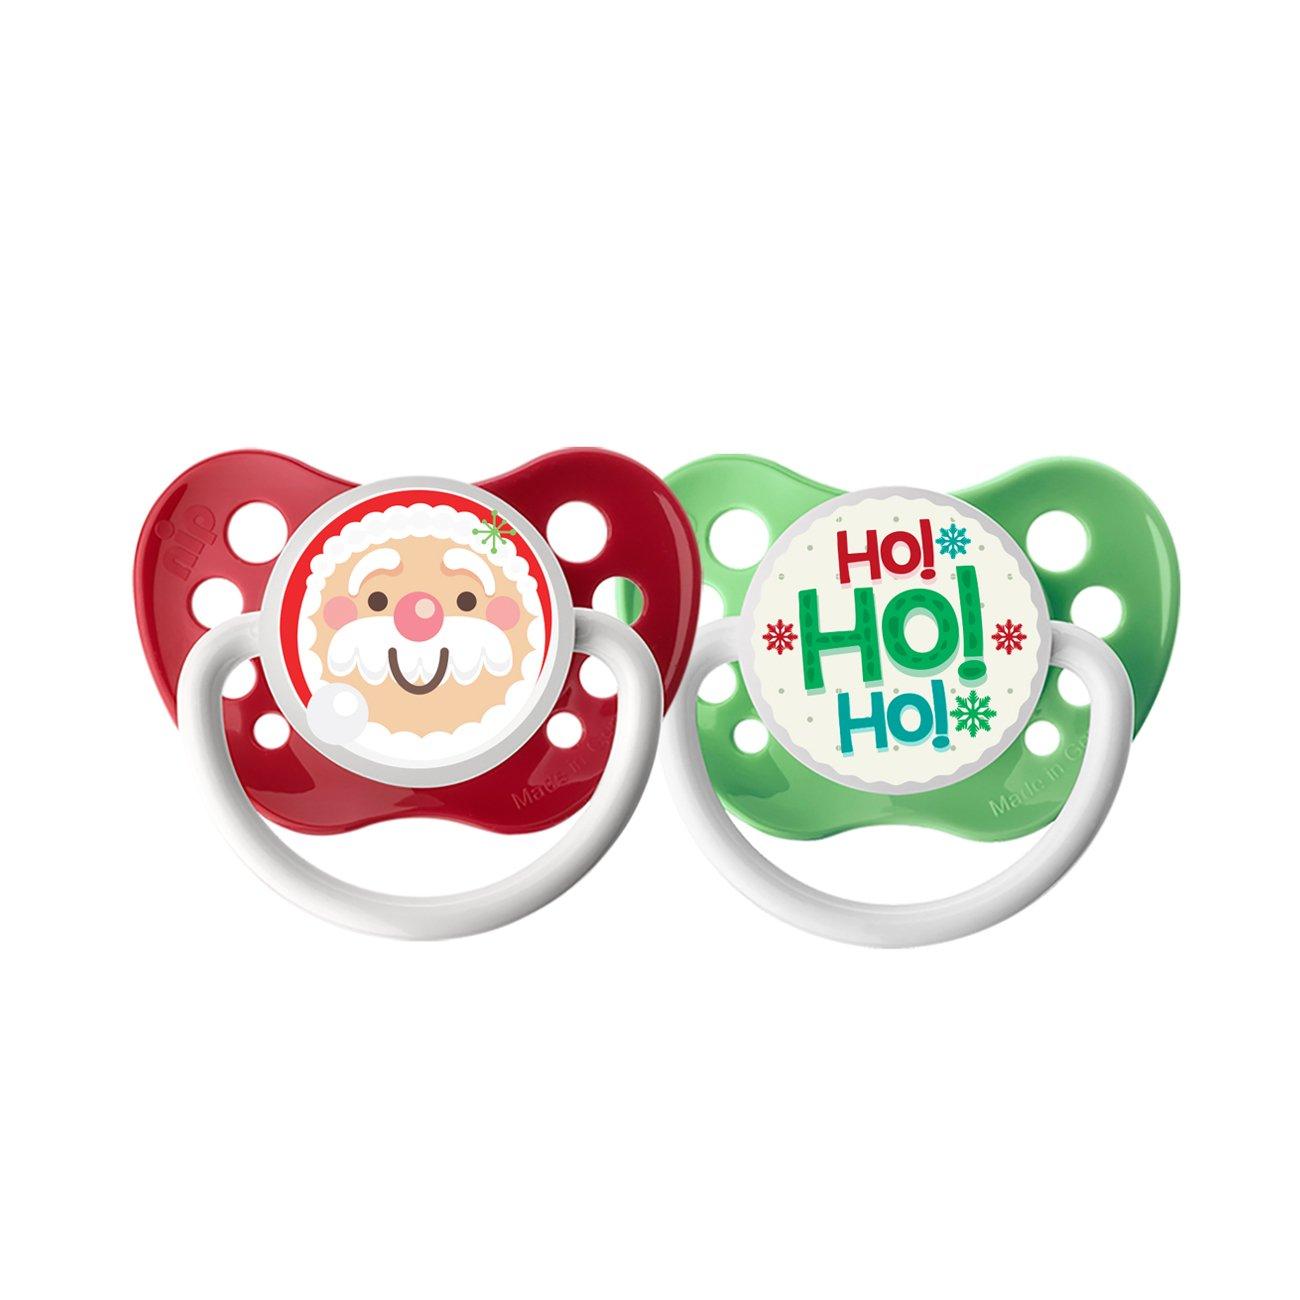 Amazon.com: Ulubulu Chupete de día festivo, Navidad Santa ...